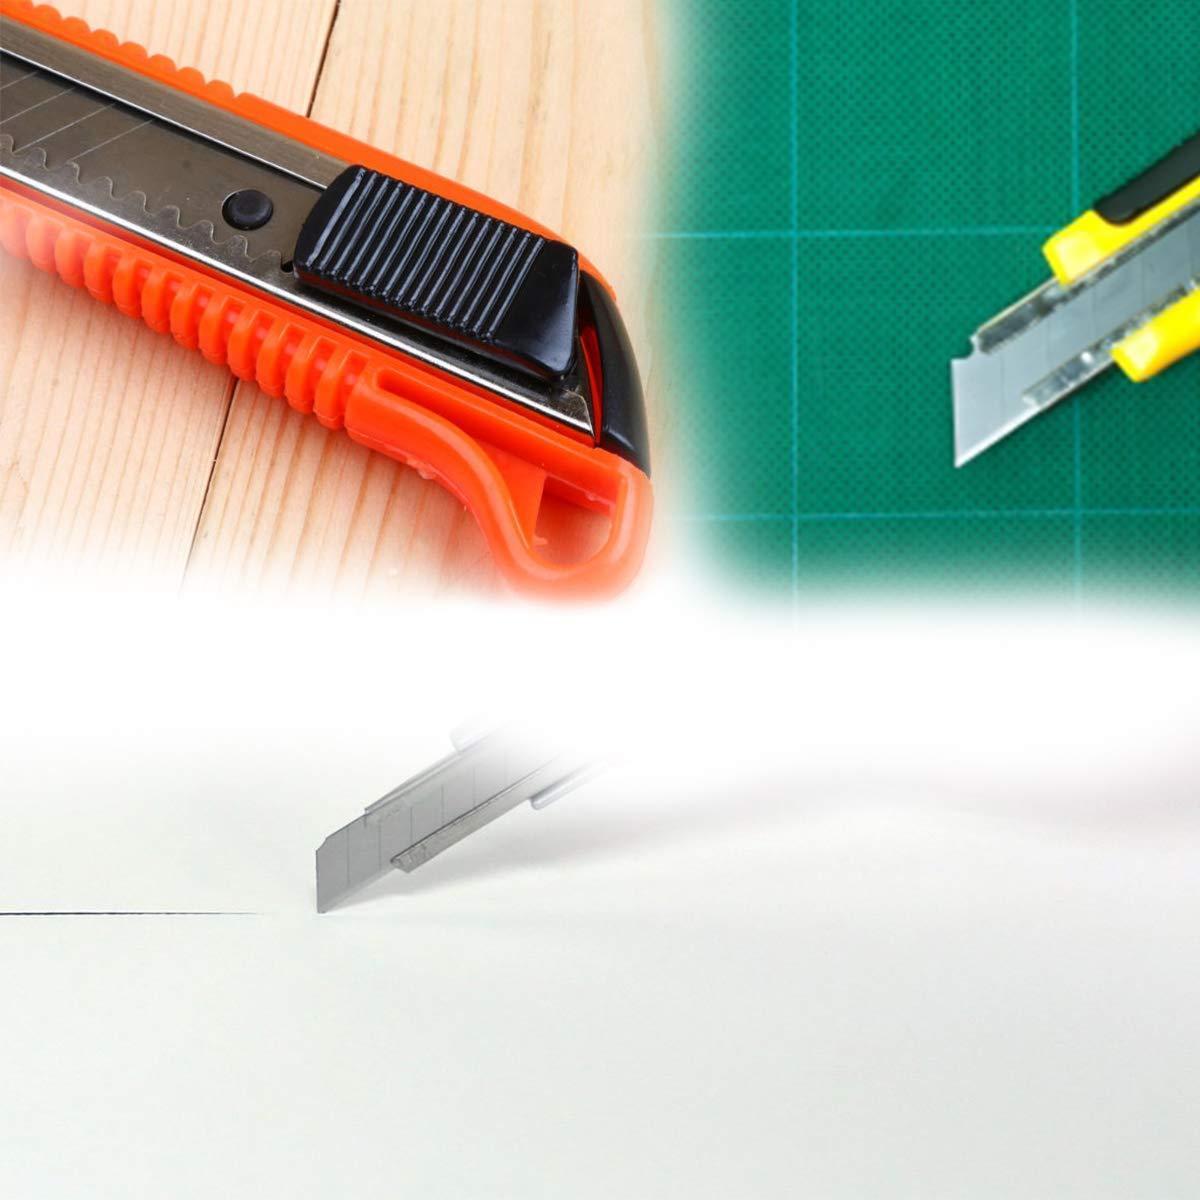 Knife Cutter Set (18 mm) - Unnati Enterprises